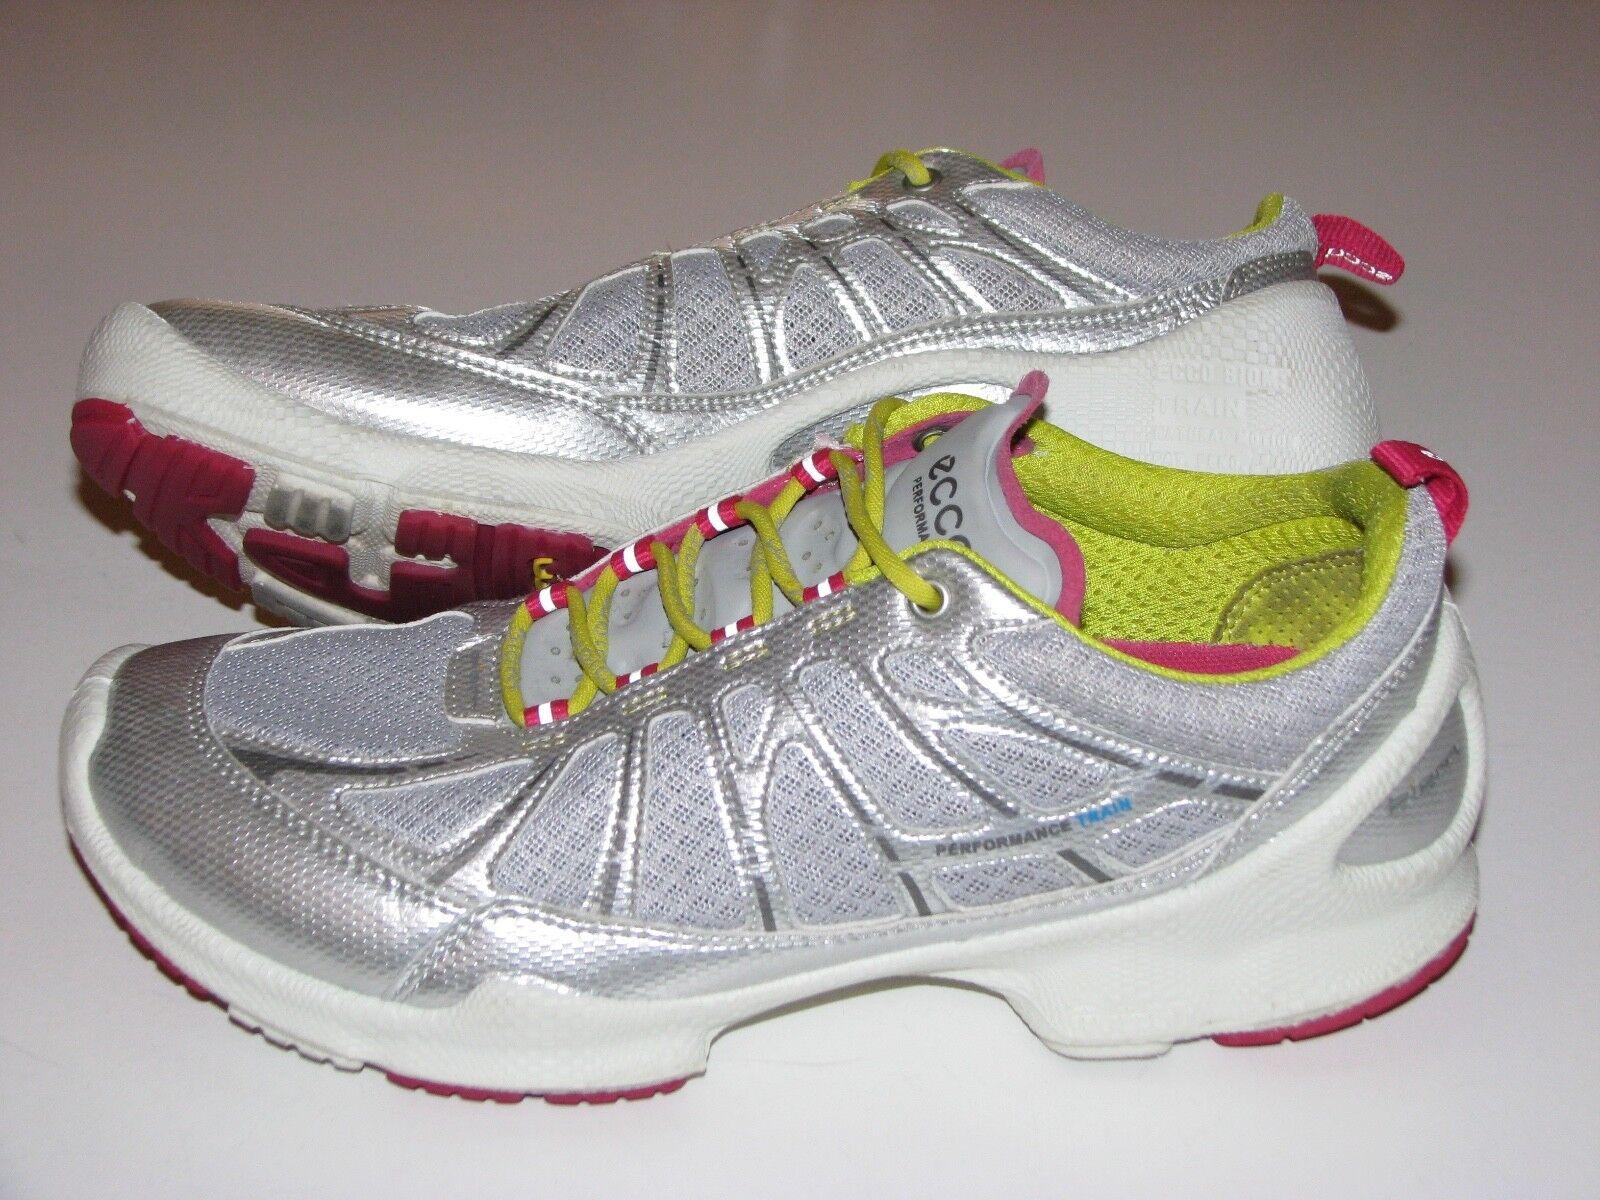 Ecco Biom Performance Train Natural Motion shoes sz 8M, 38 Euro